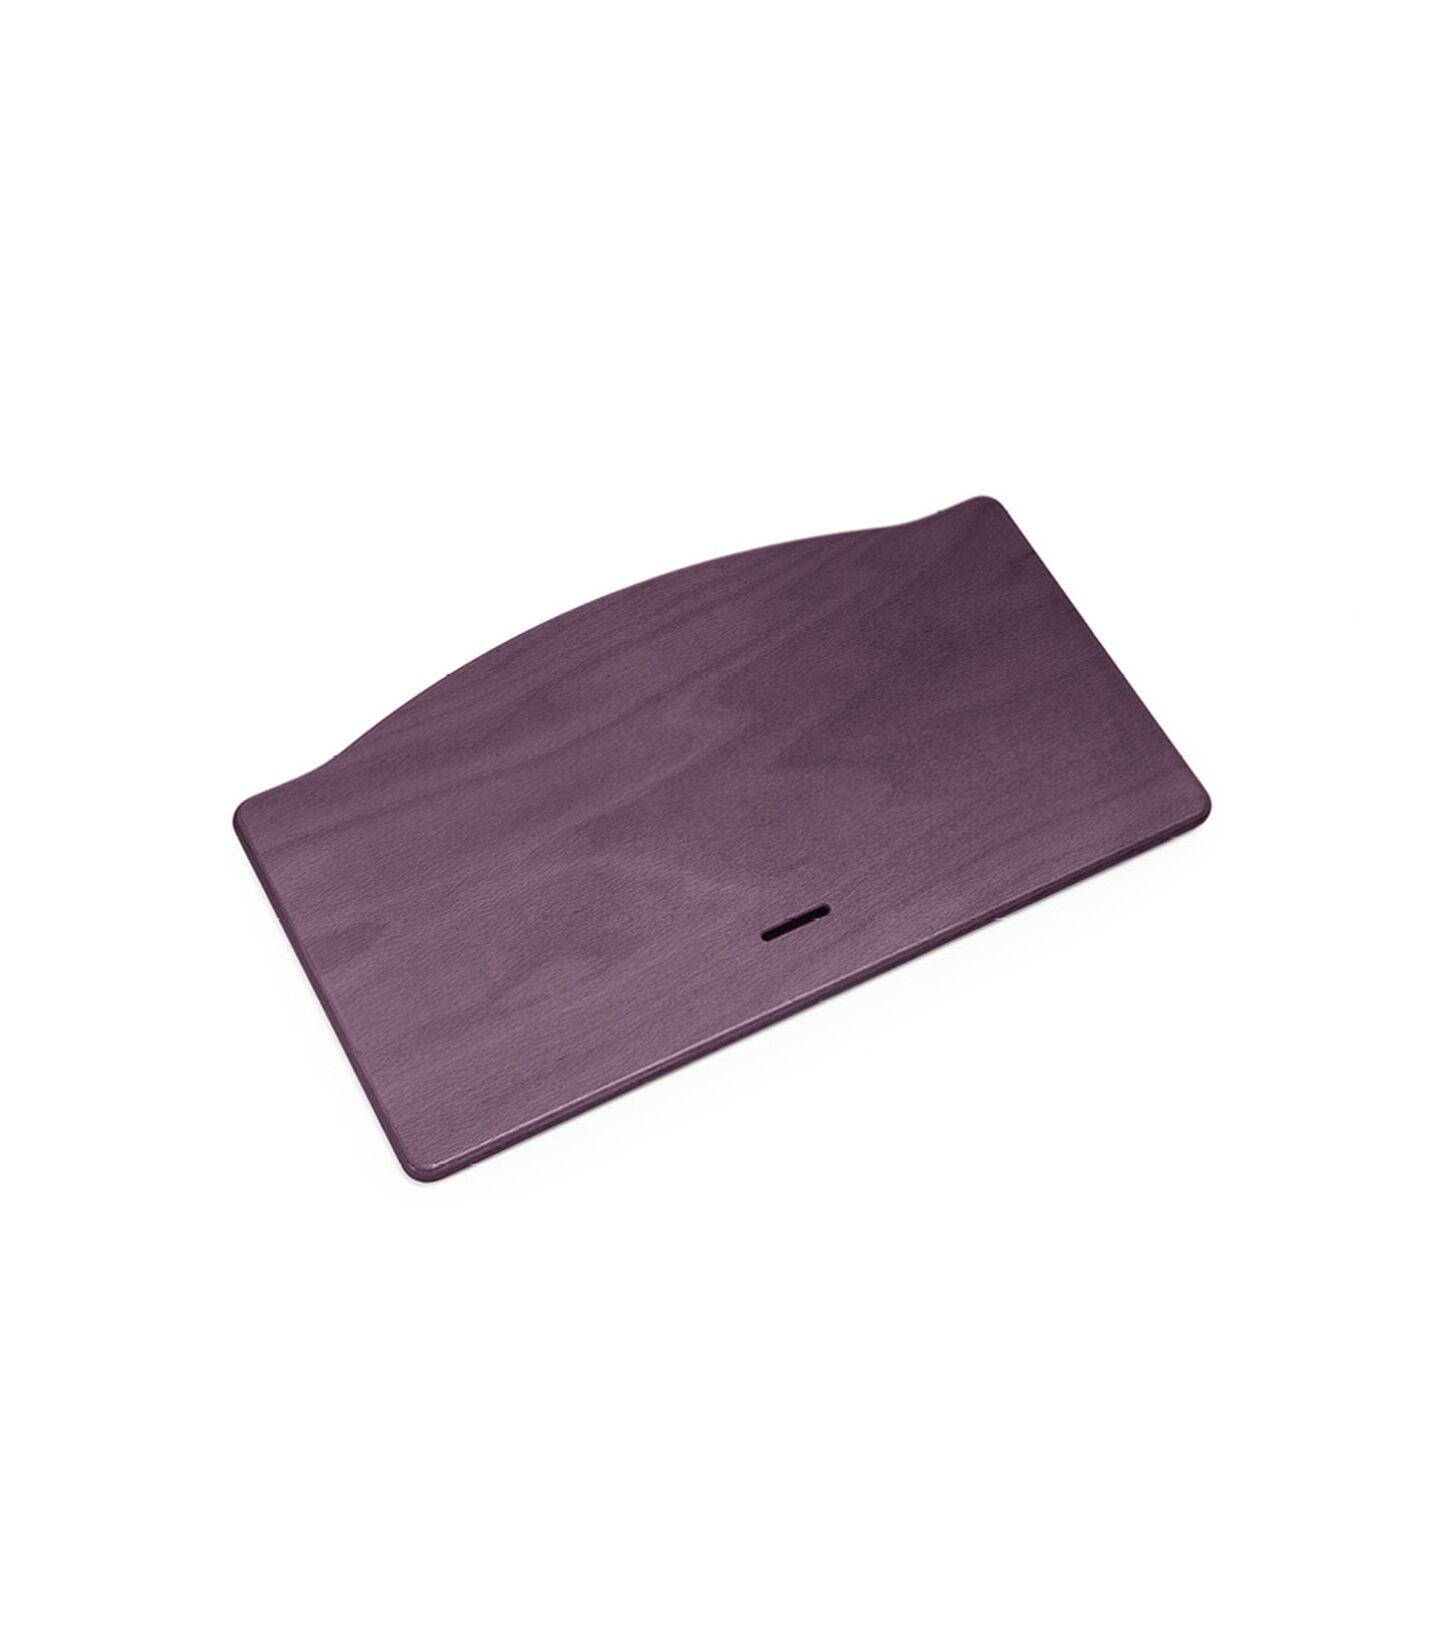 Tripp Trapp® Seatplate Plum Purple, Plum Purple, mainview view 2